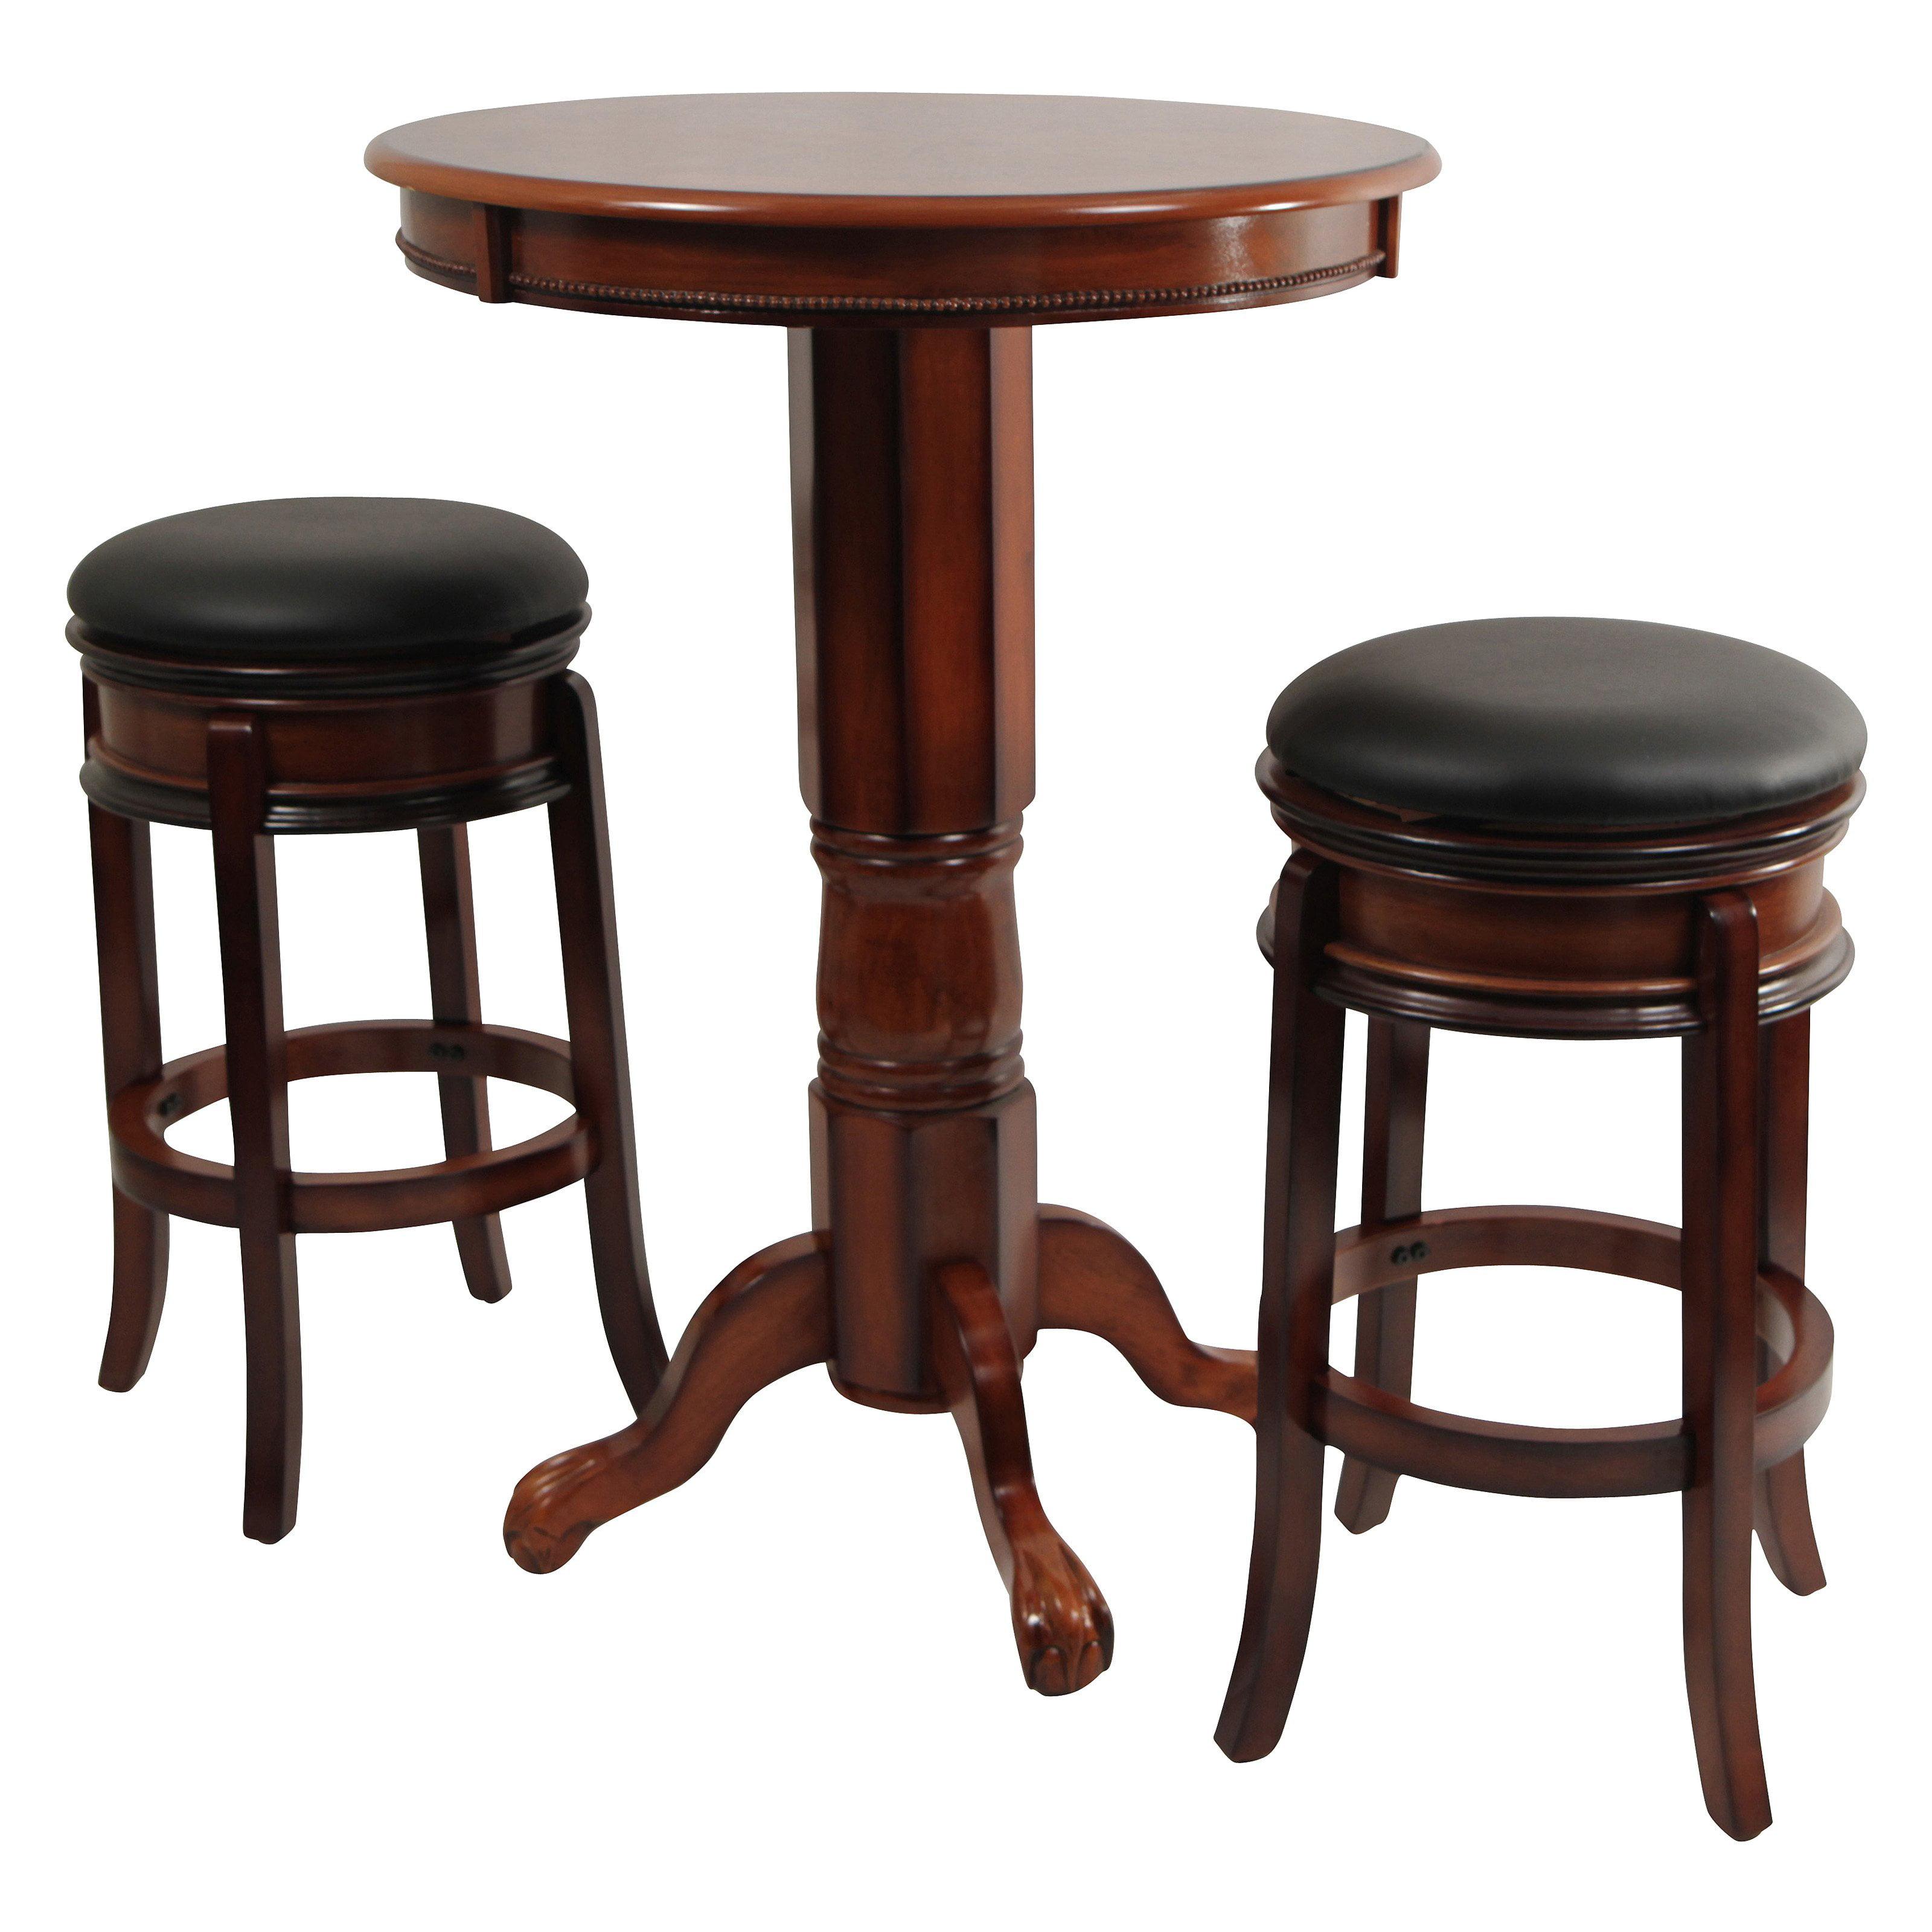 sc 1 st  Walmart & Boraam Magellan 3 Piece Pub Table Set - Walmart.com